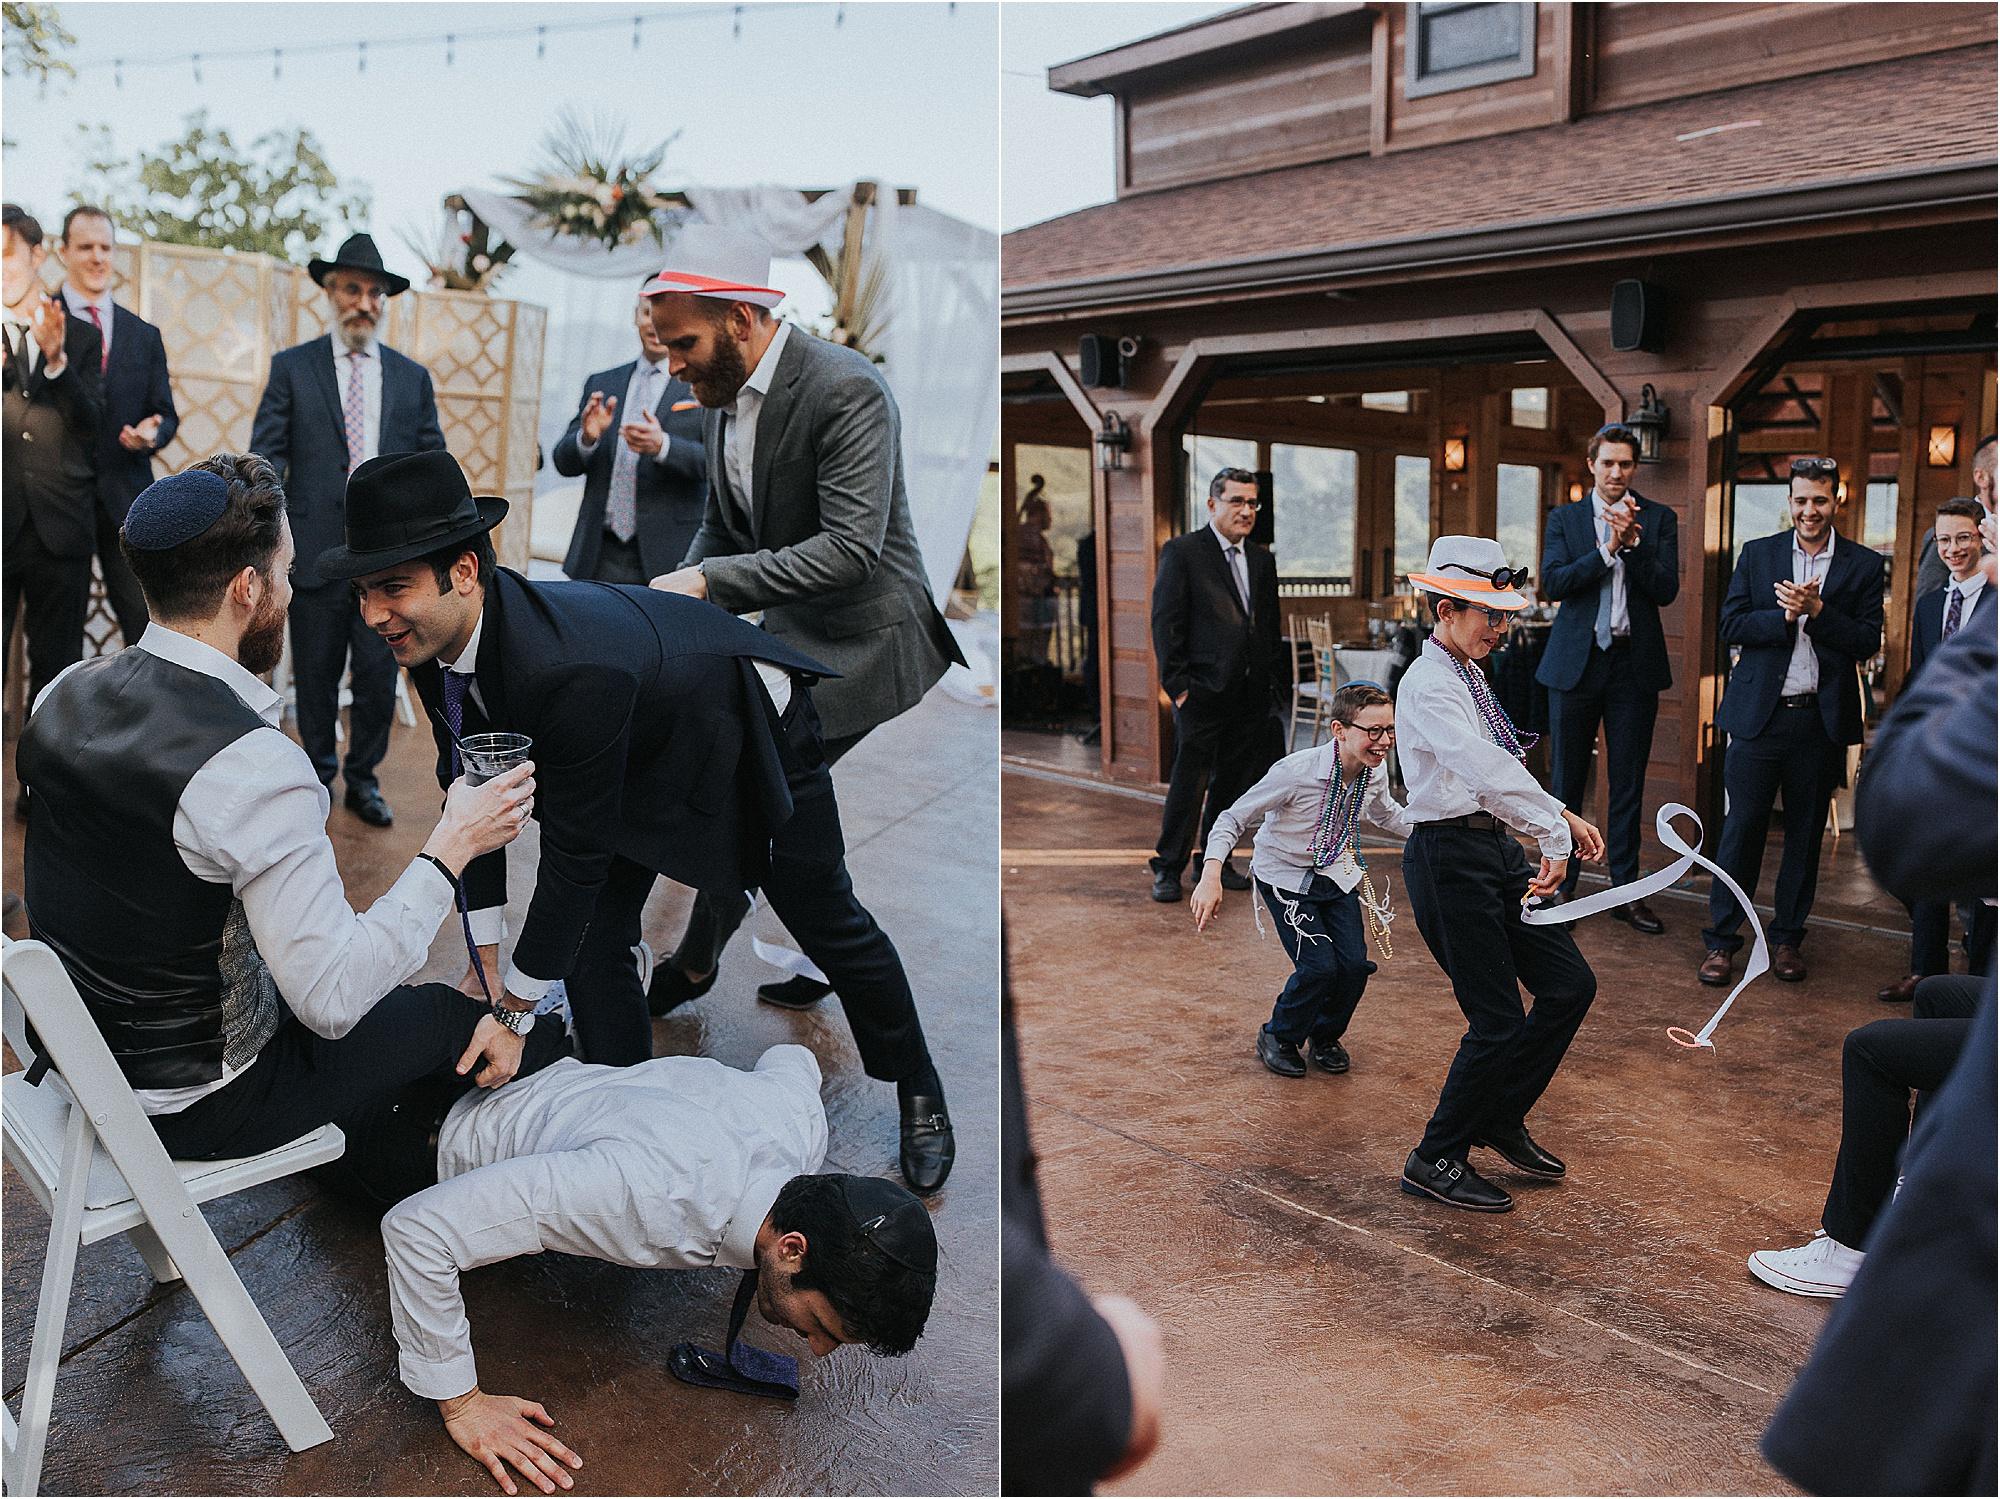 joyful wedding reception at Jewish wedding